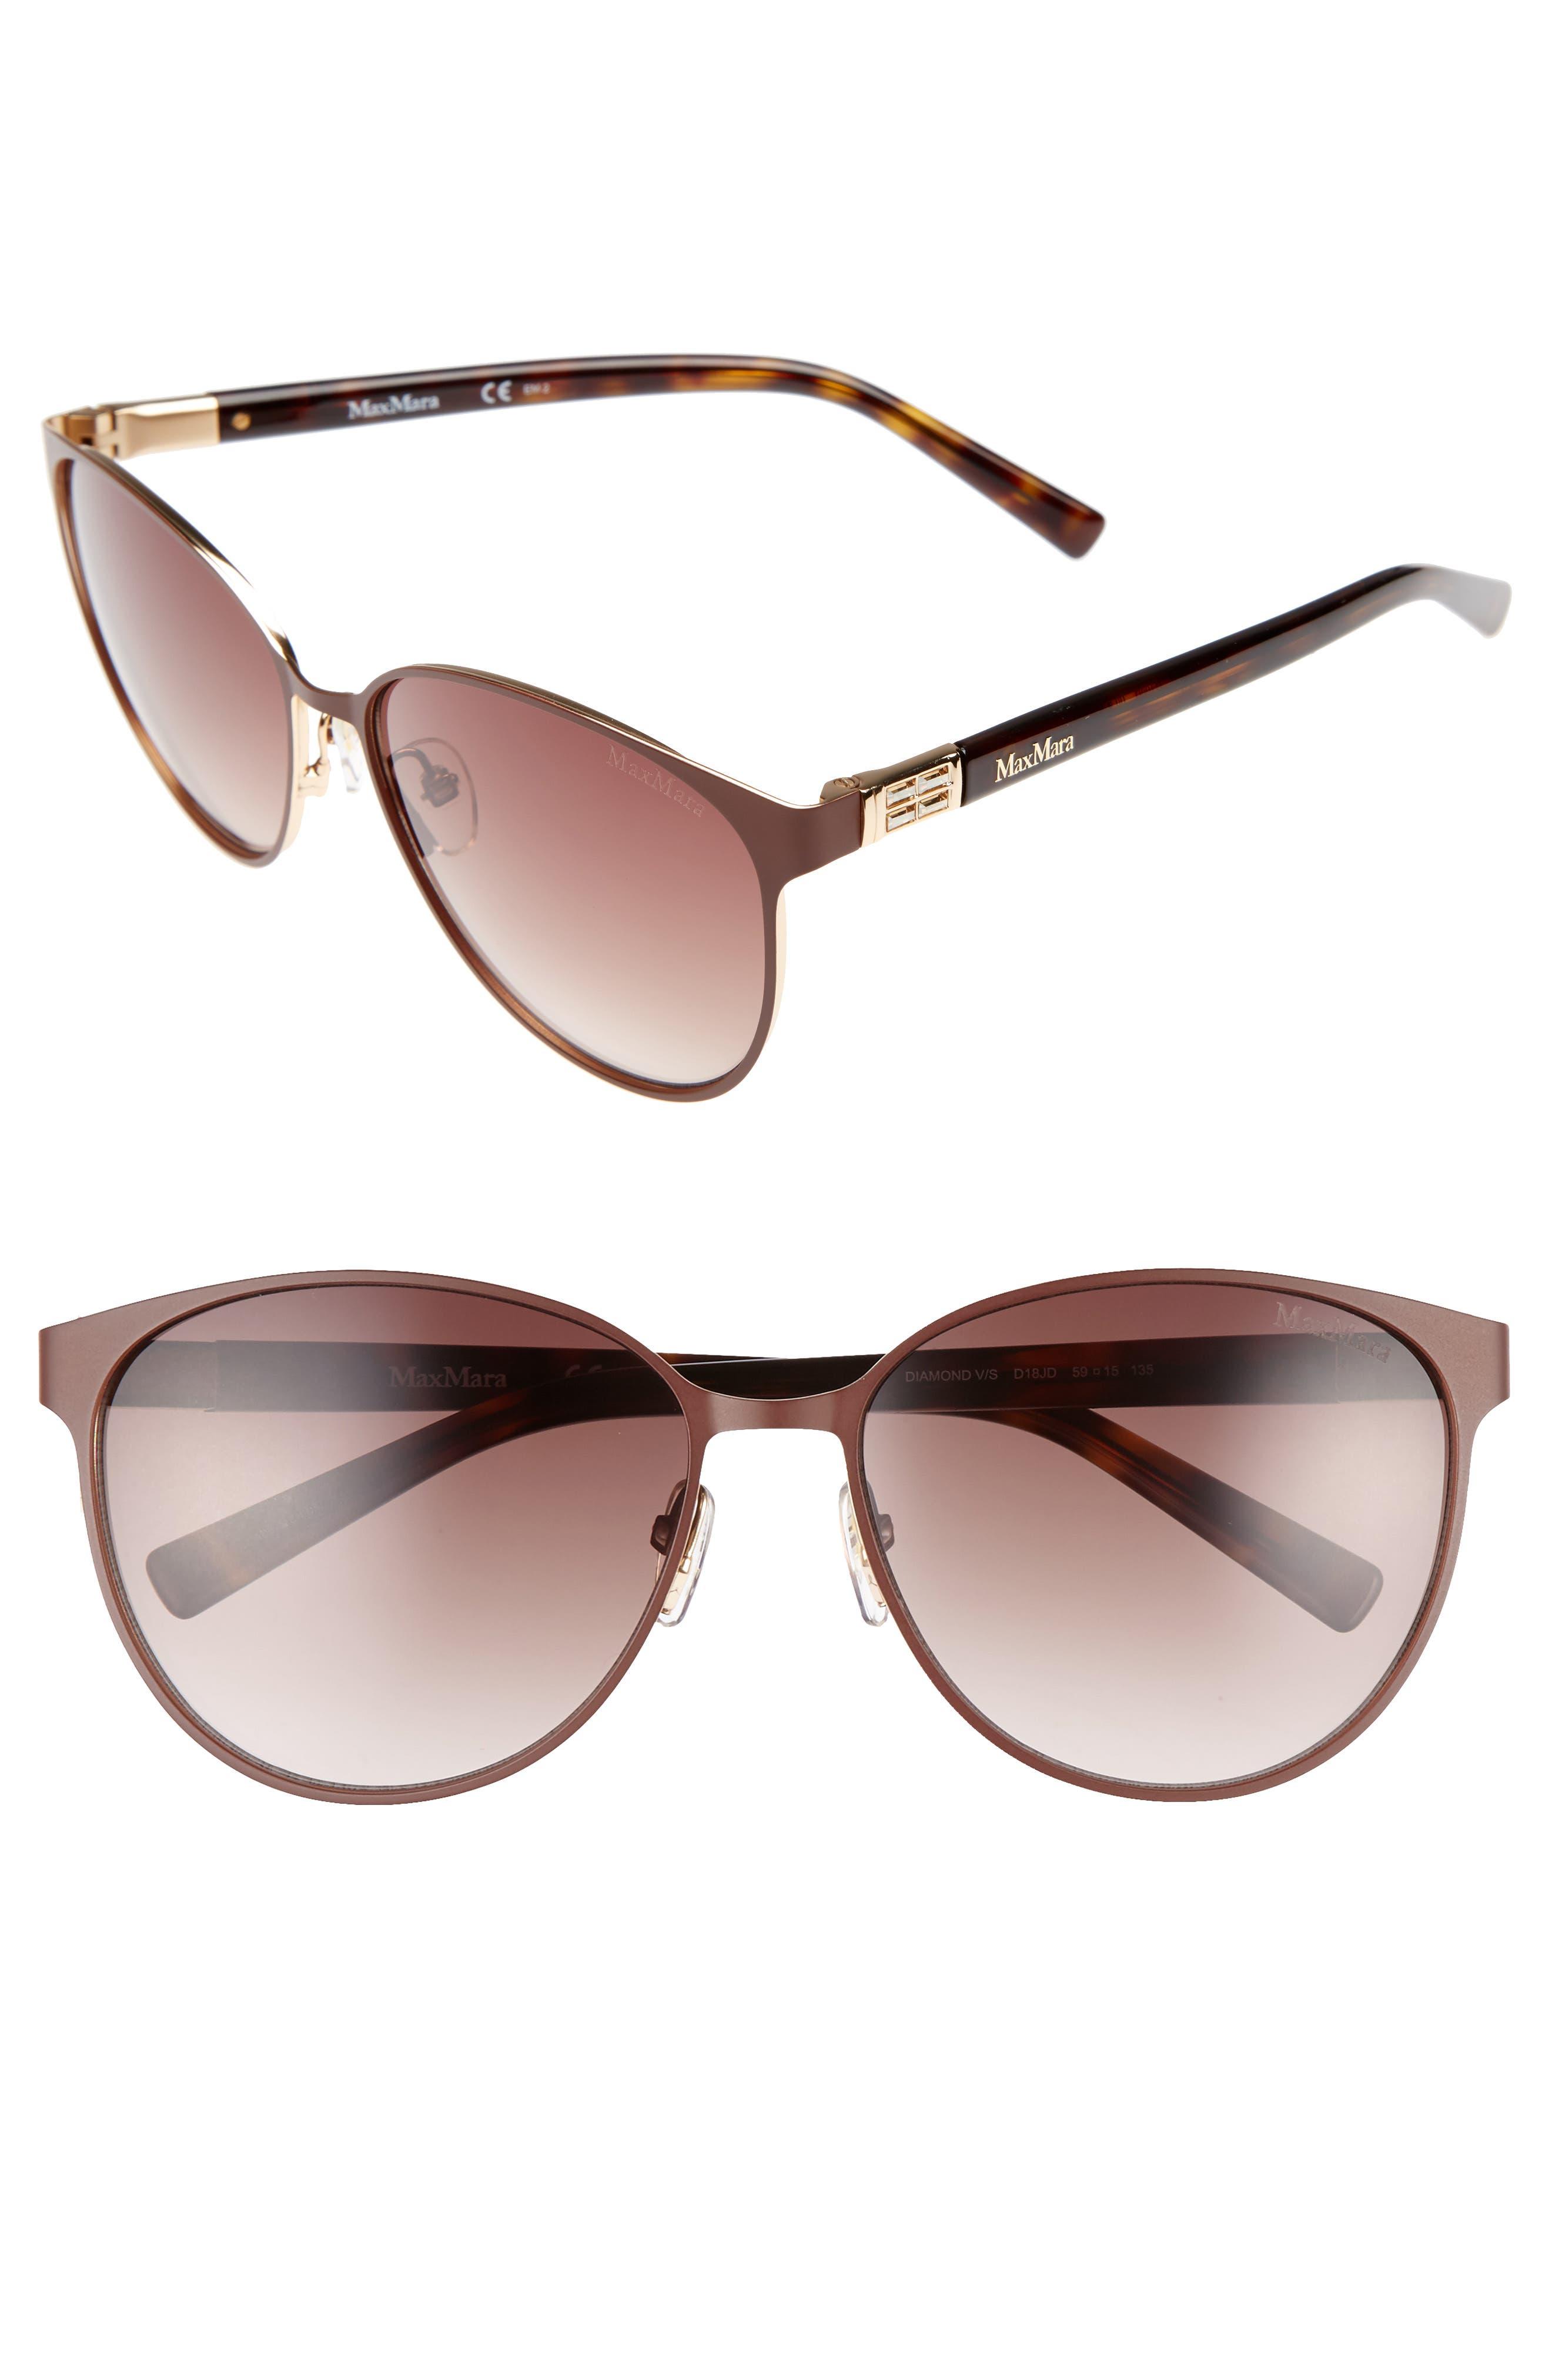 Diamov 59mm Gradient Cat Eye Sunglasses,                             Main thumbnail 1, color,                             Matte Brown